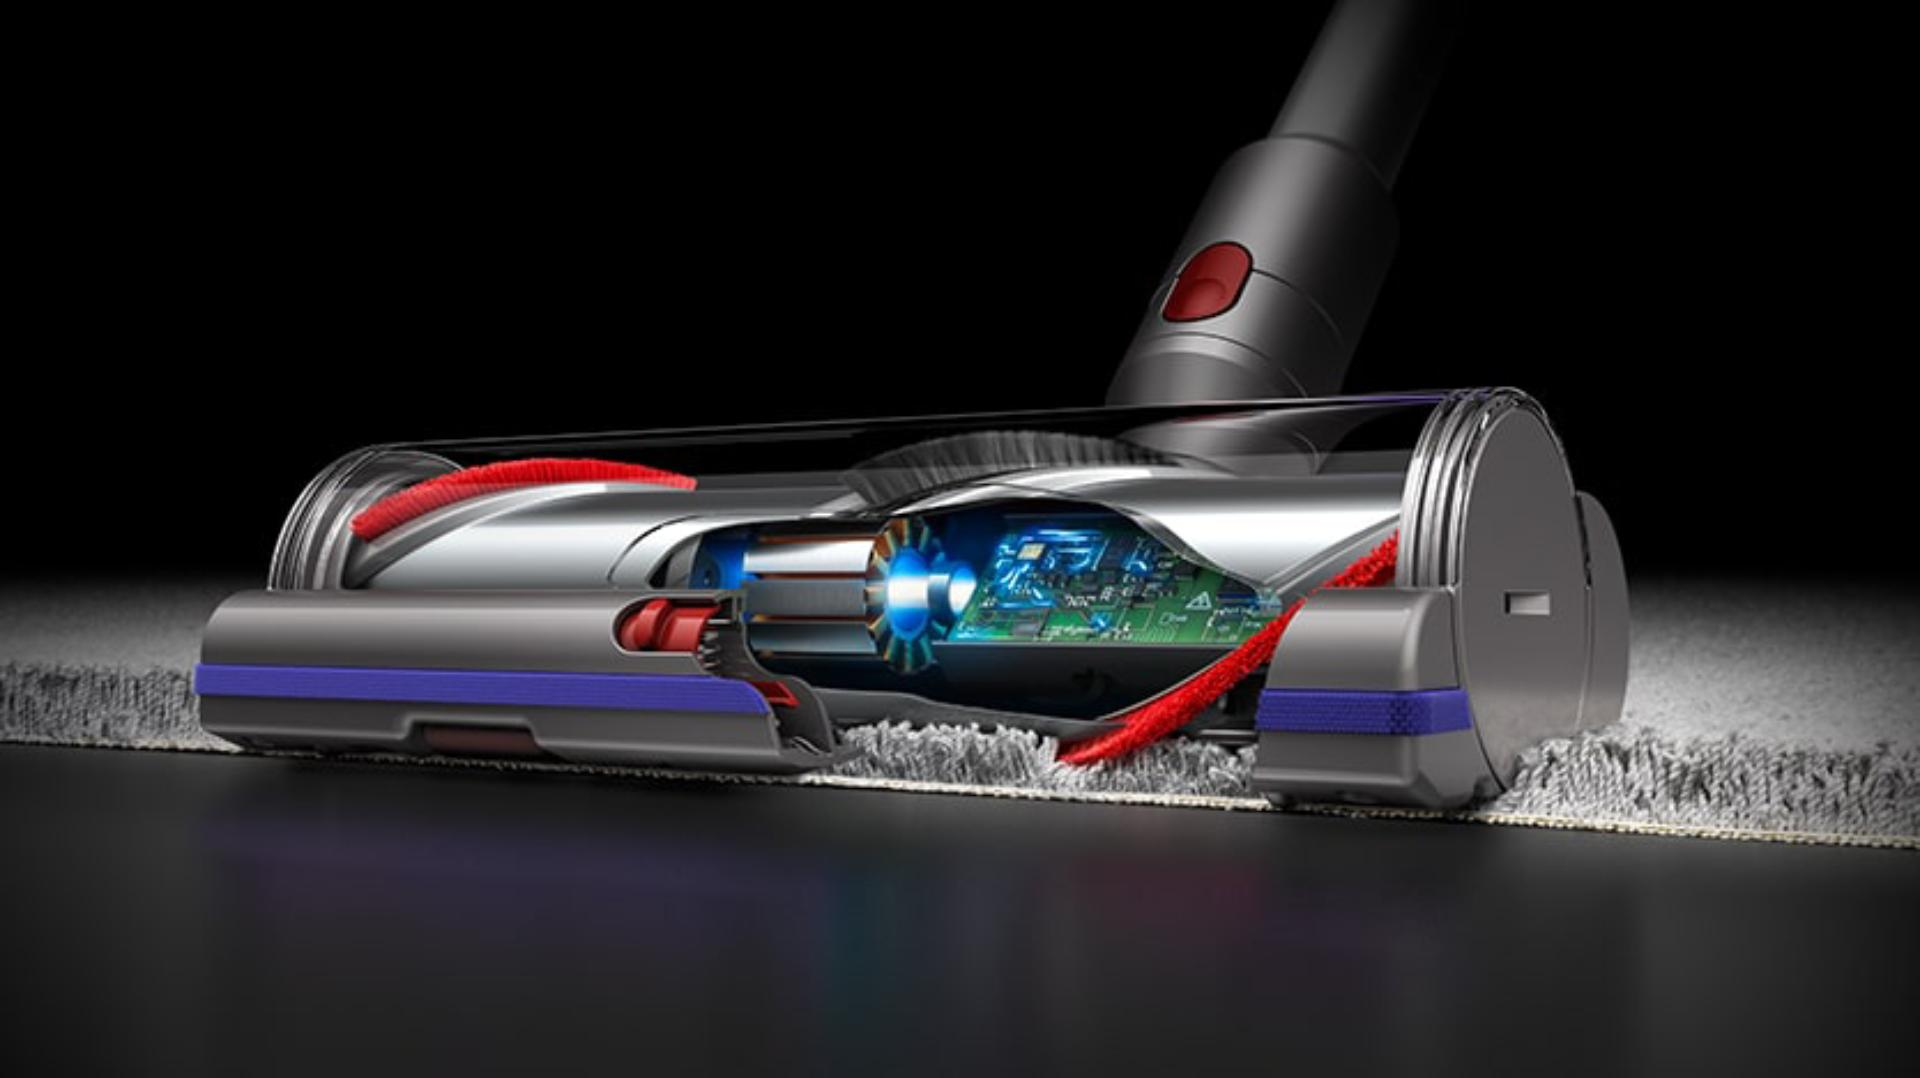 Brush bar technology of Dyson V11 stick vacuum